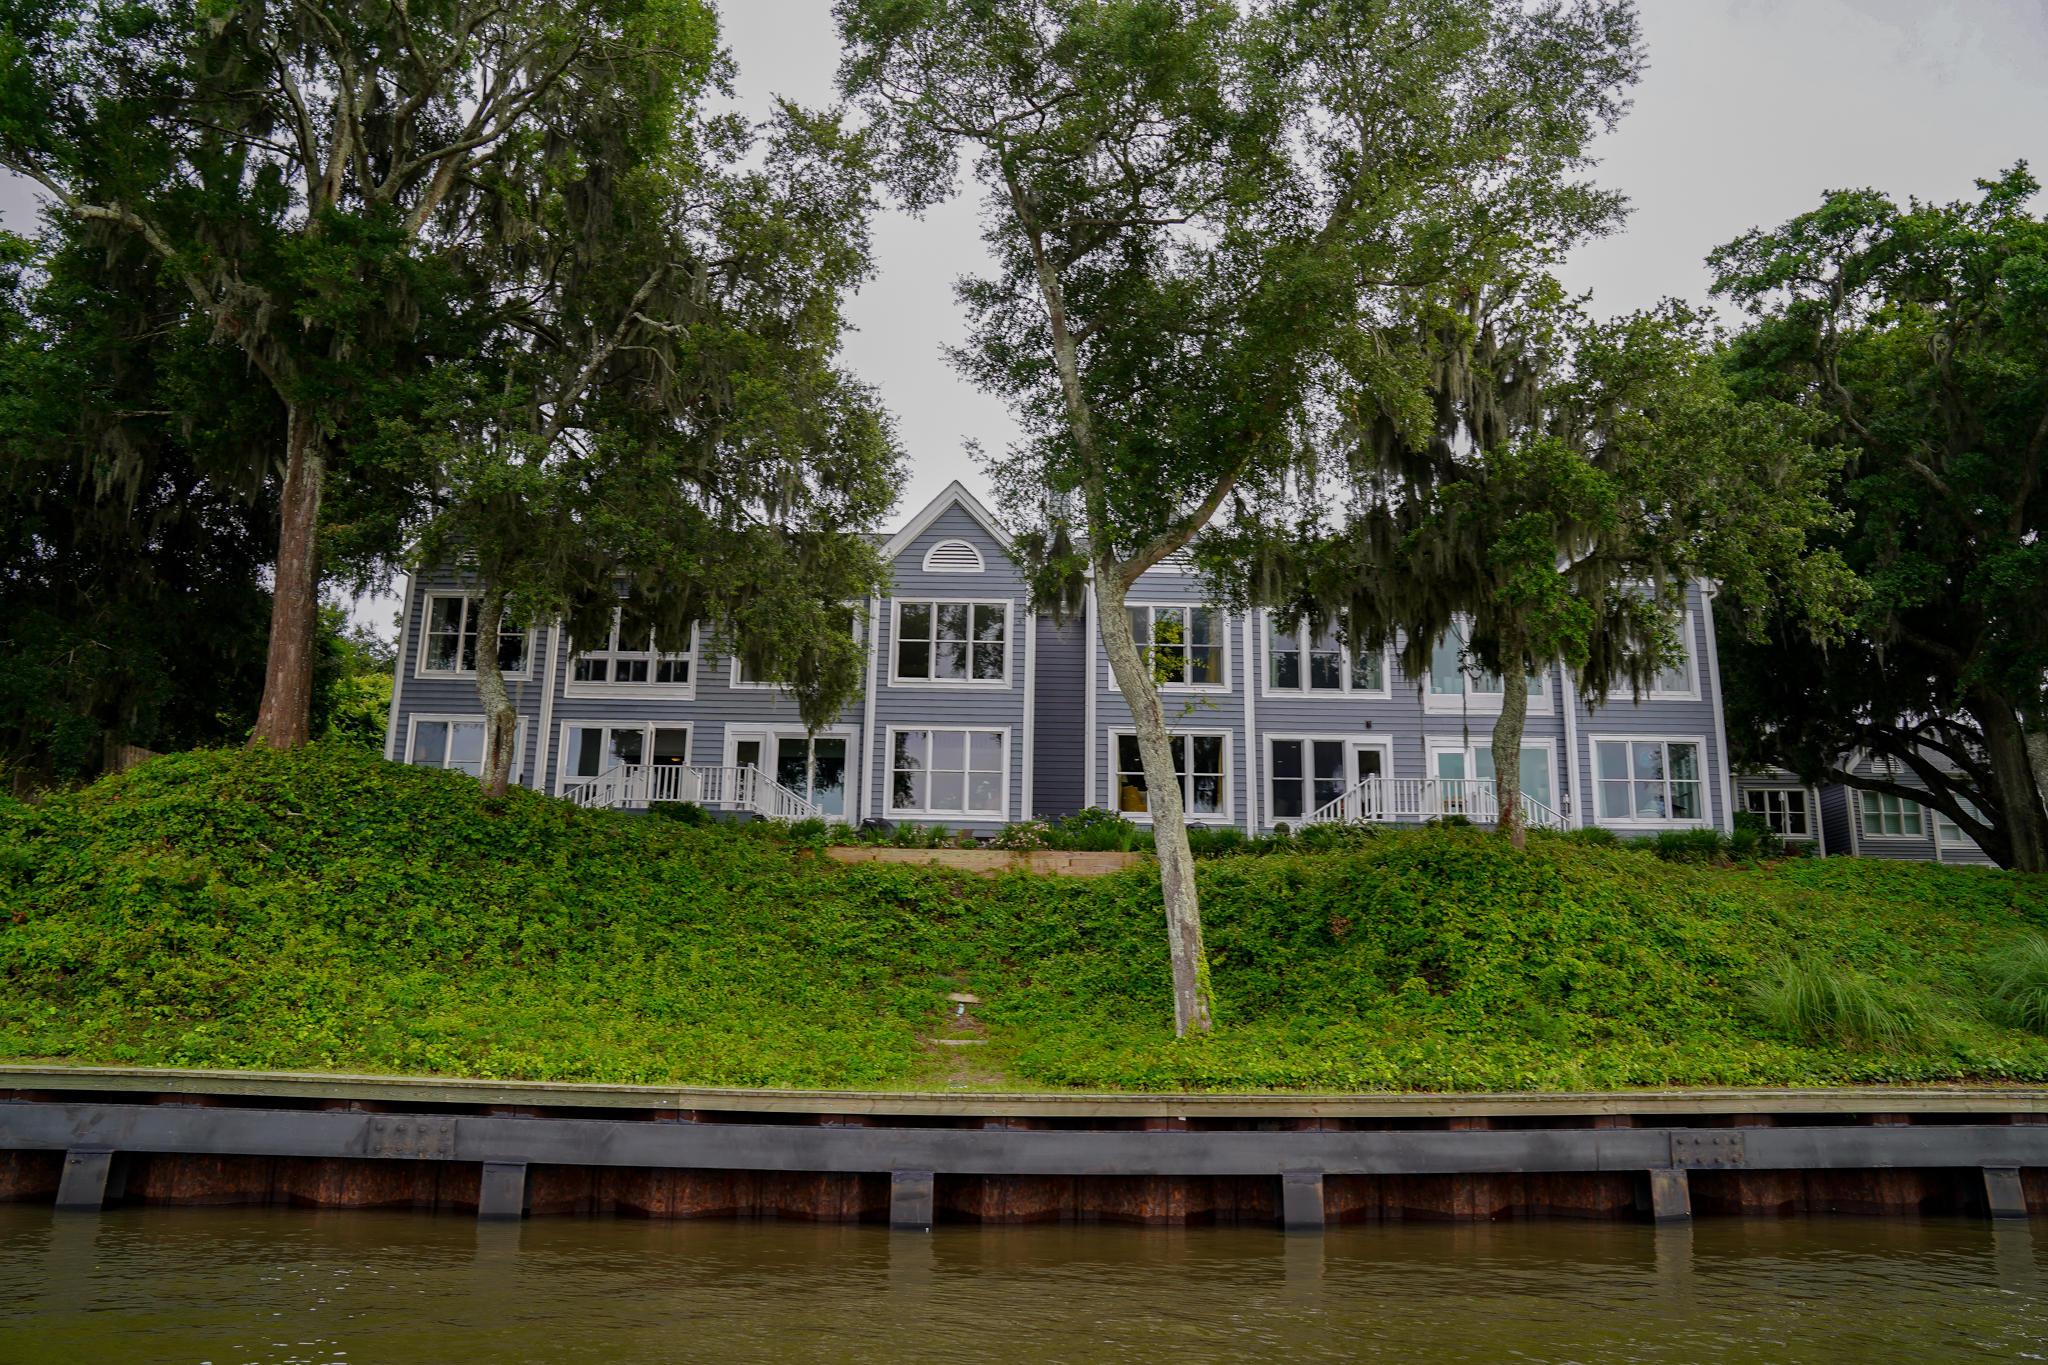 Waterfront Plantation Homes For Sale - 112 Waterfront Plantation, Charleston, SC - 1